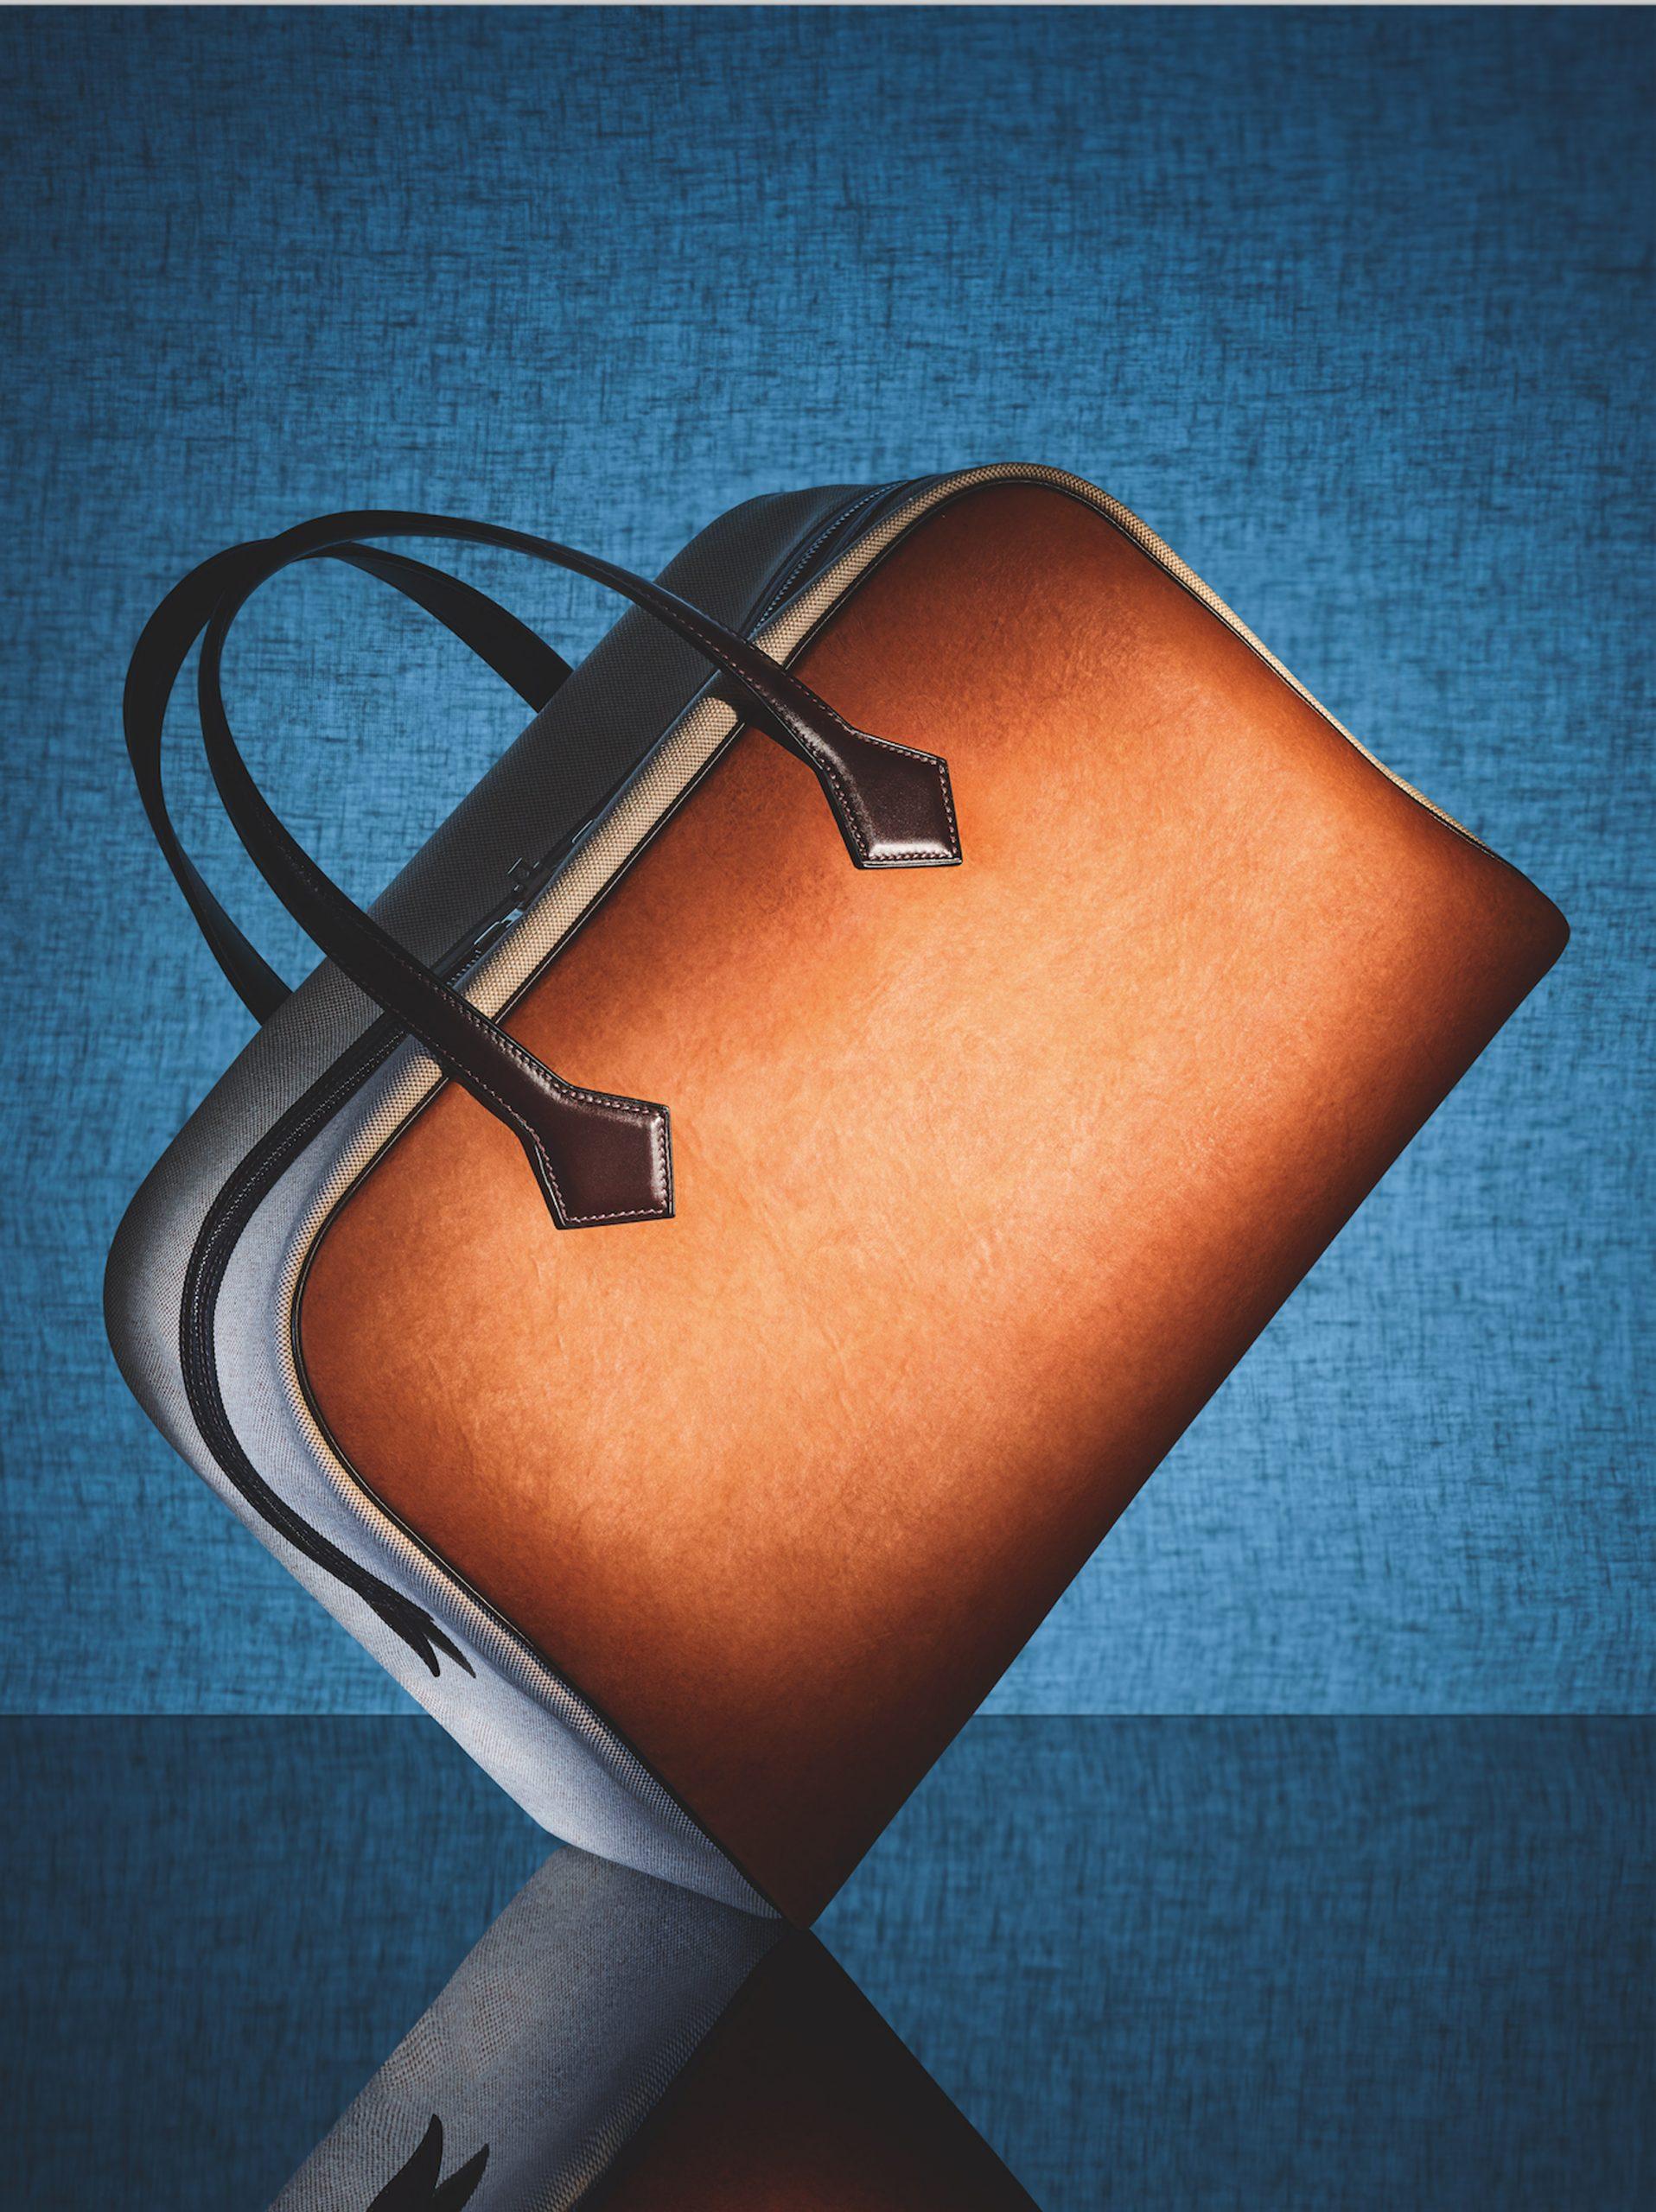 Hermes Victoria bag in Sylvania mycelium leather by MycoWorks